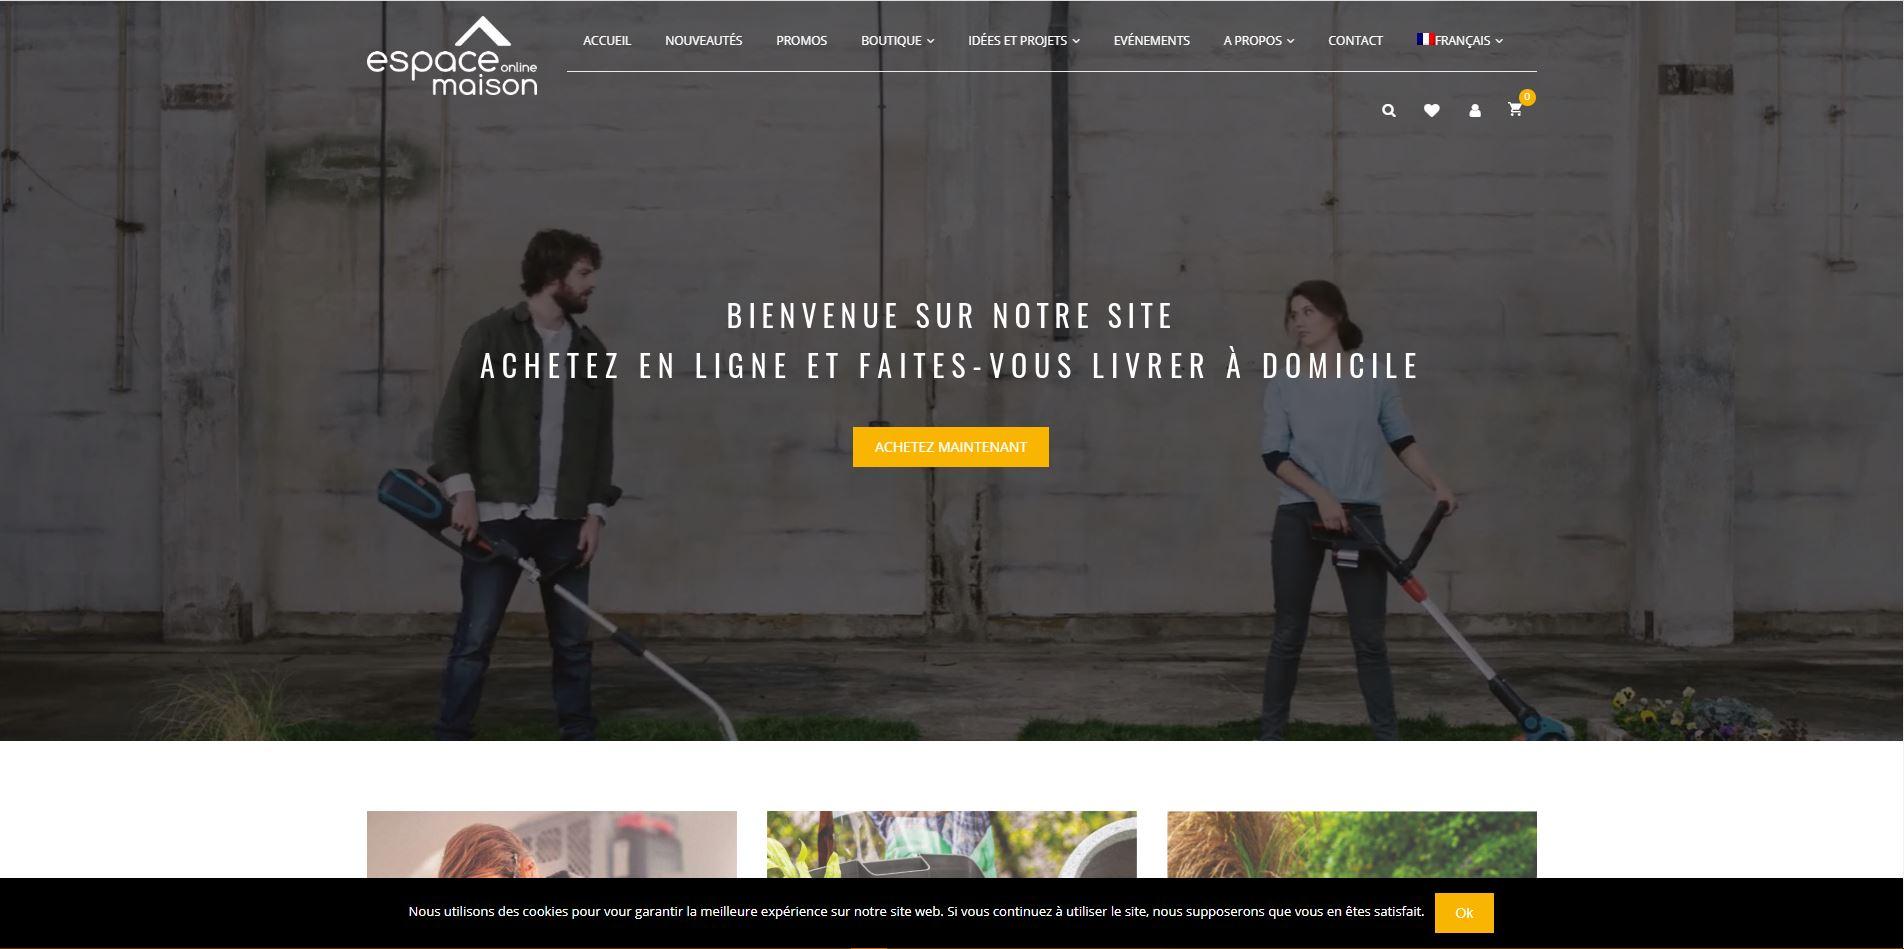 espace-maison-digital-marketing-mauritius-e-commerce